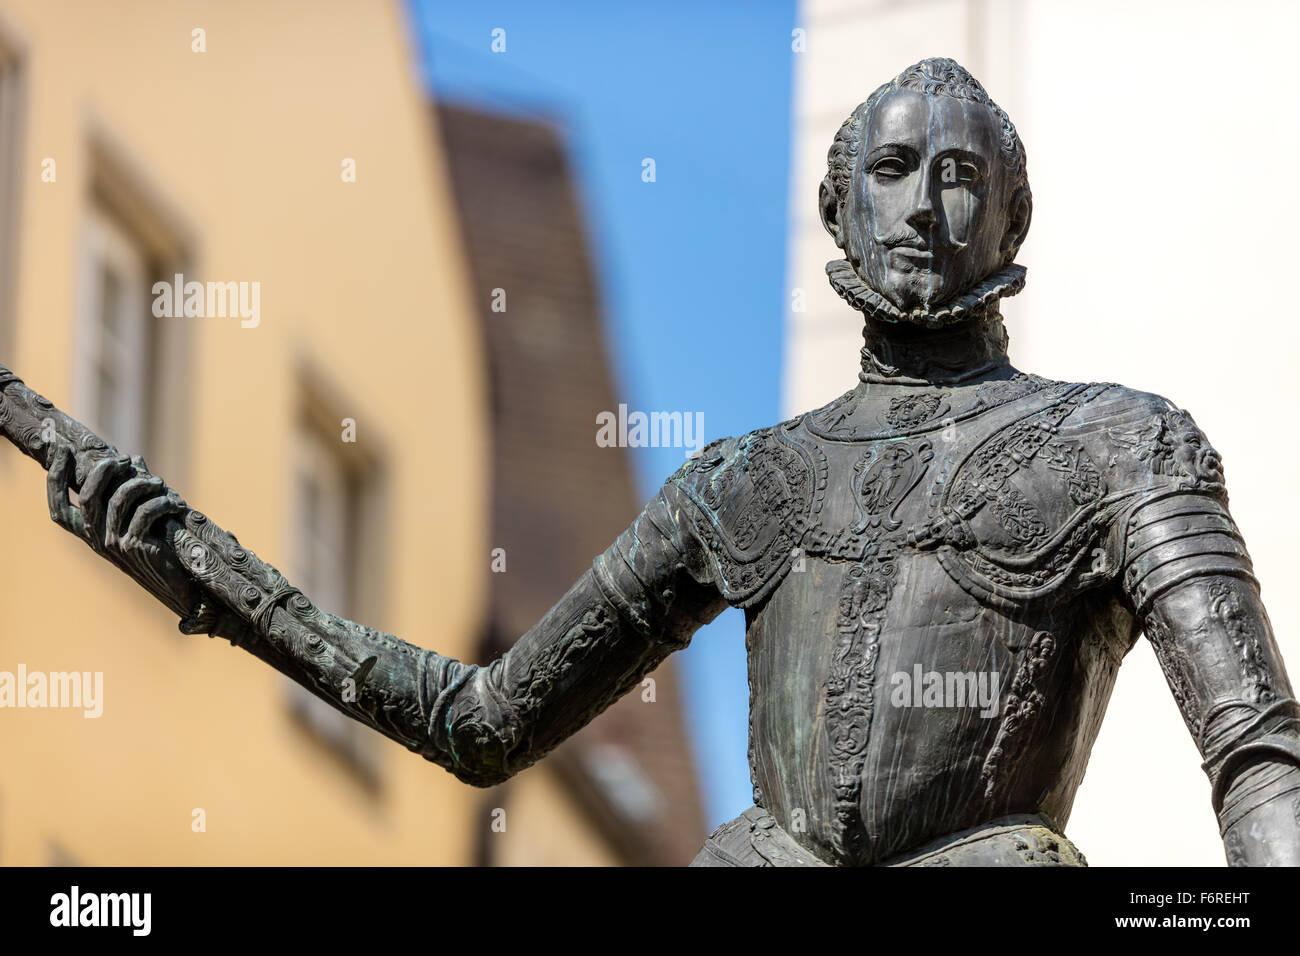 Don Juan de Austria, Statue, illegitimate son of Emperor Charles V, who was born in Regensburg in 1547, Zieroldsplatz, - Stock Image